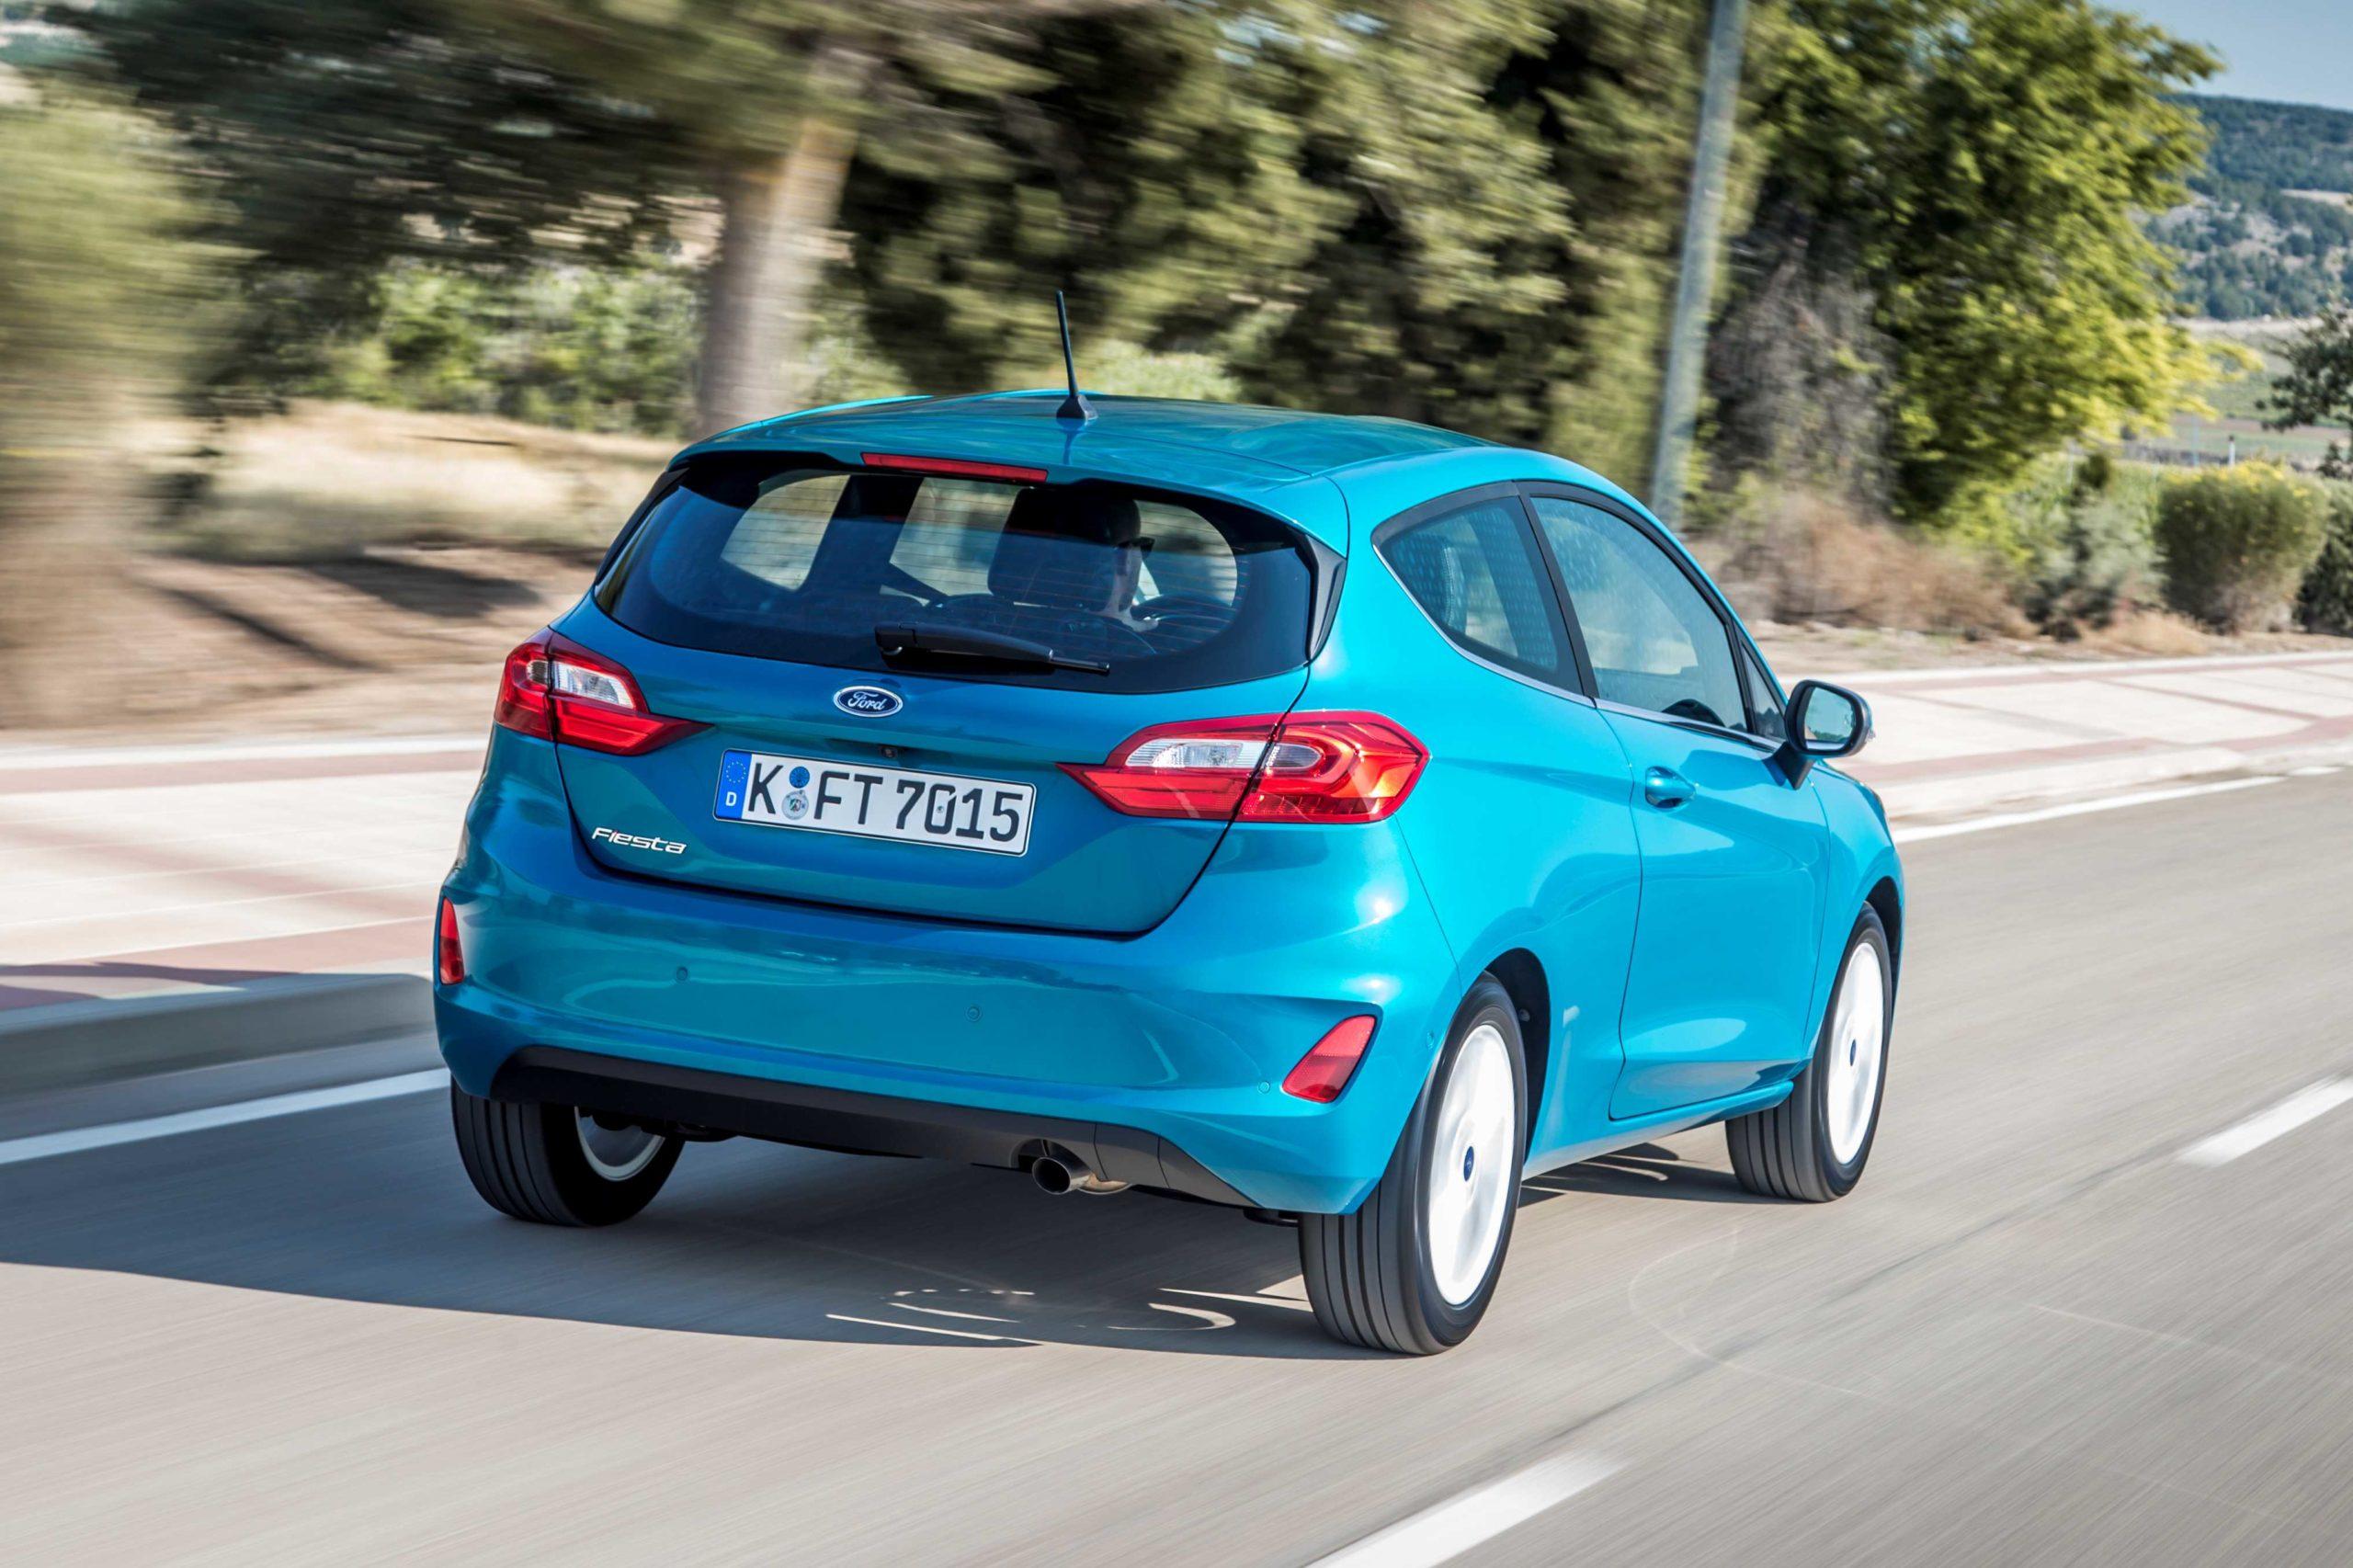 Ford_Fiesta_Rear